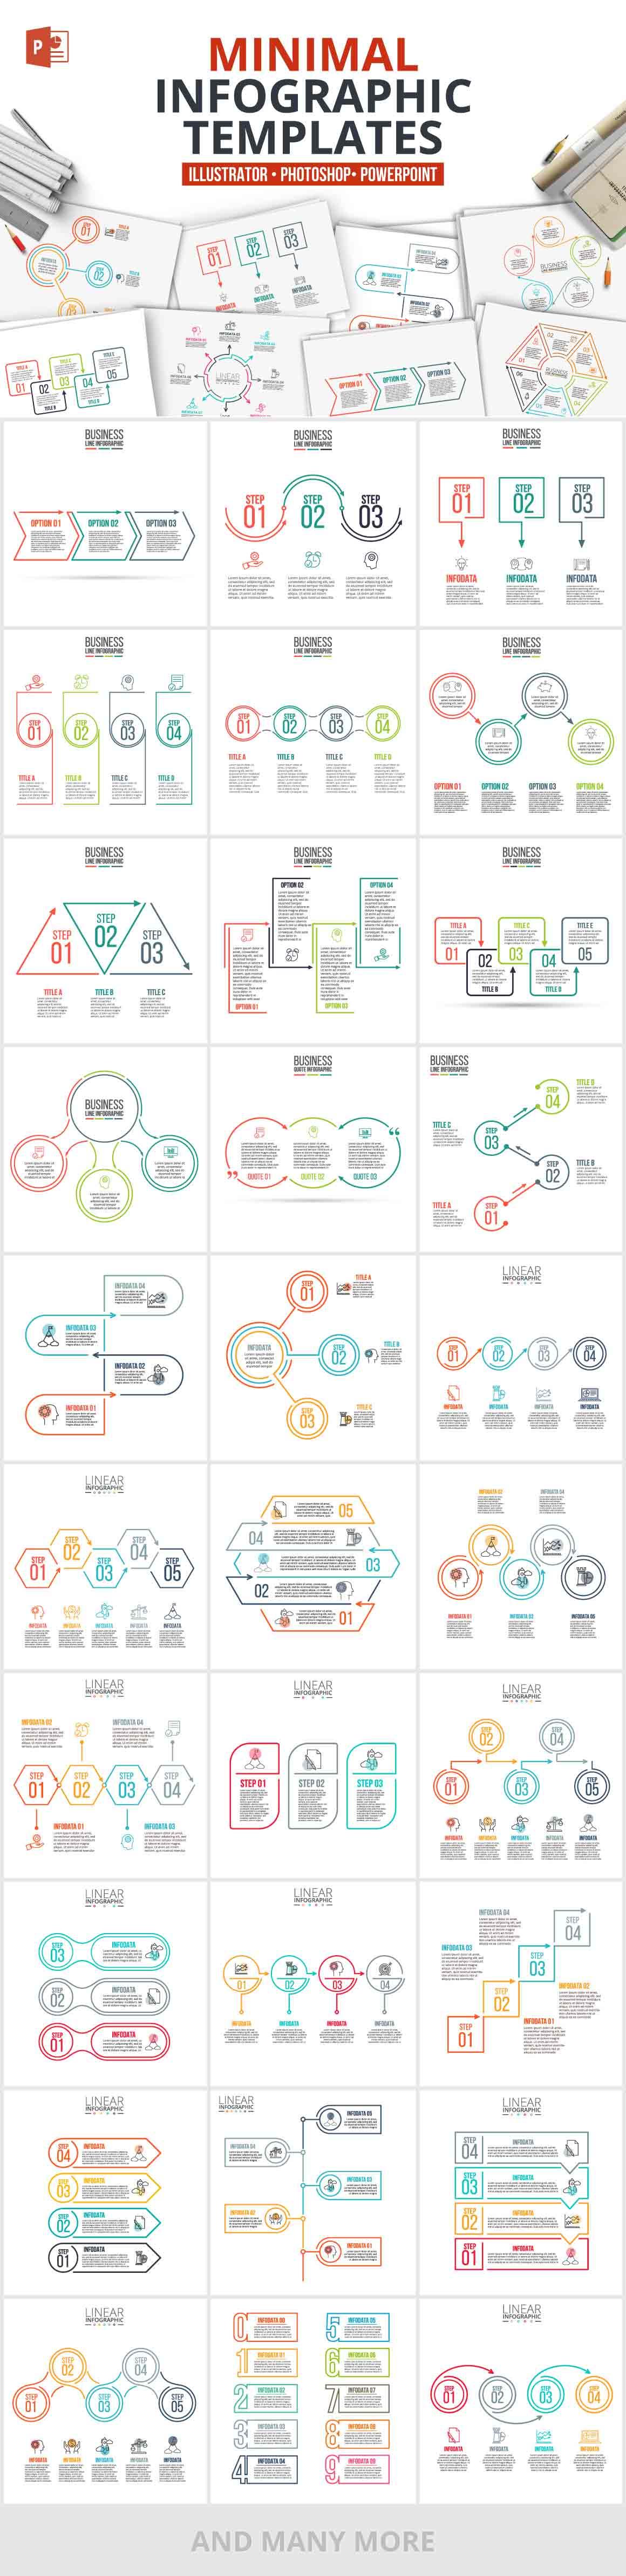 1200 Interactive Infographic Templates- 11_Minimal